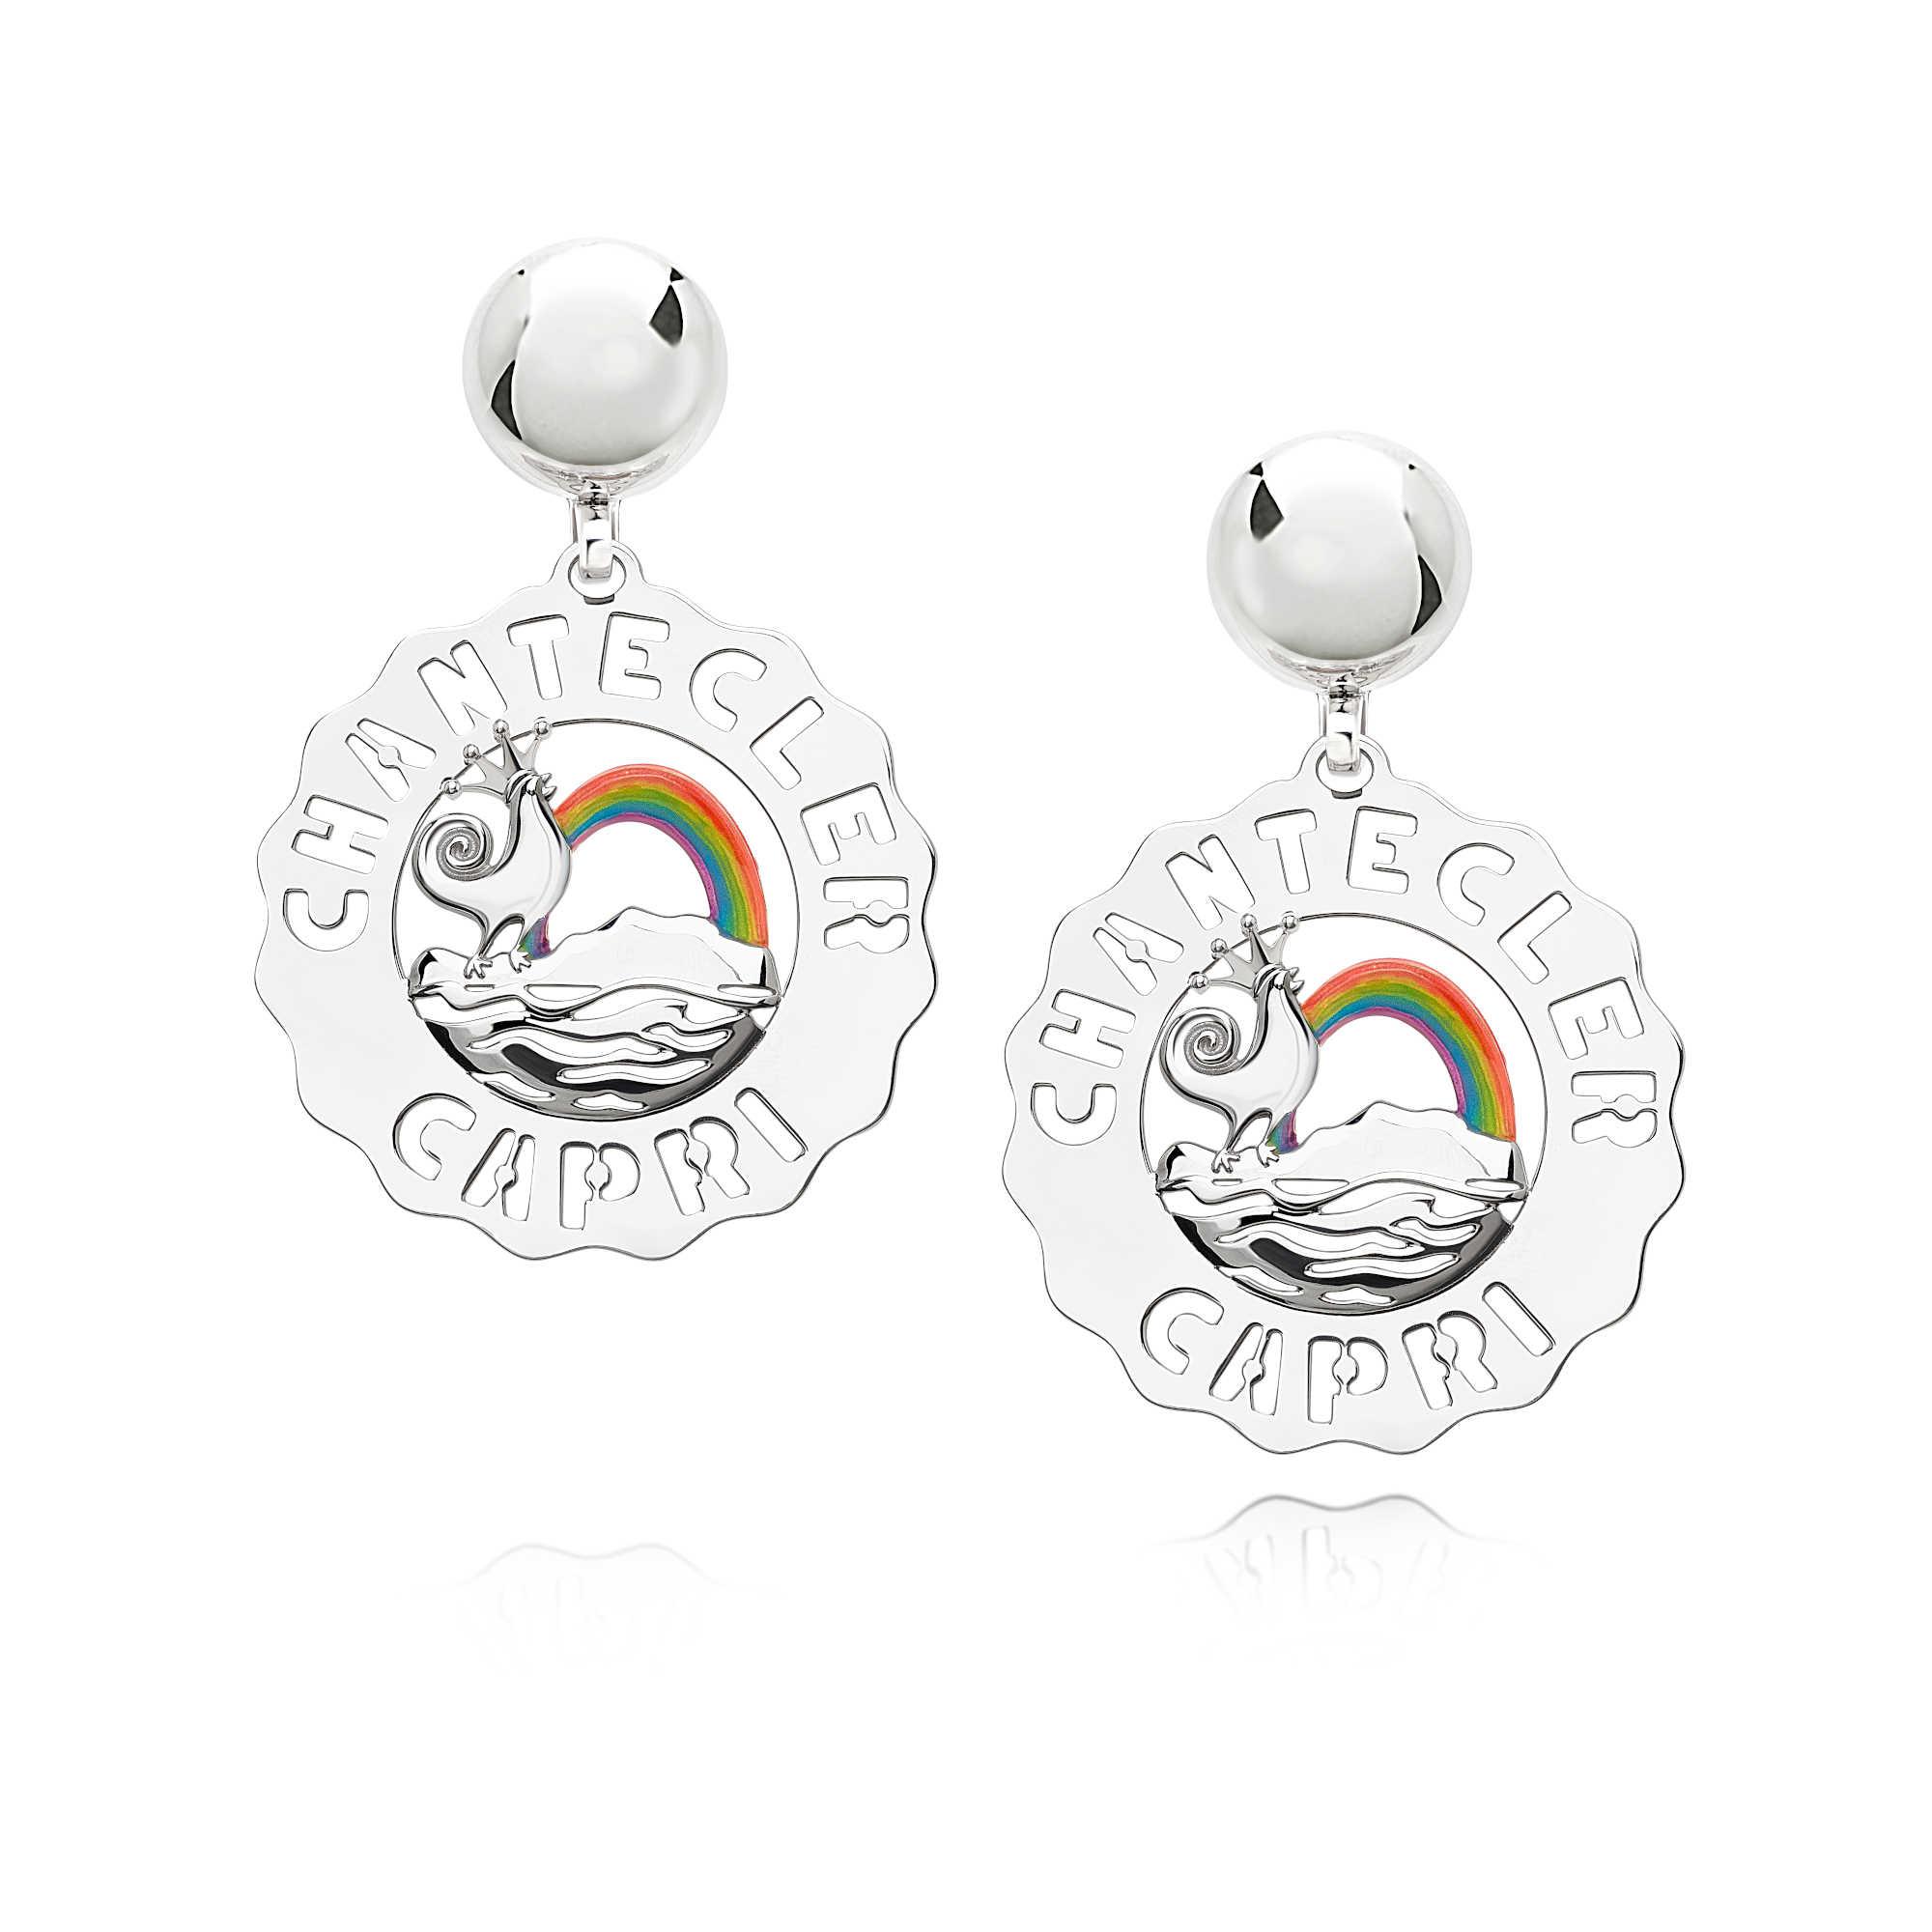 orecchini logo arcobaleno chantecler piccoli 40181